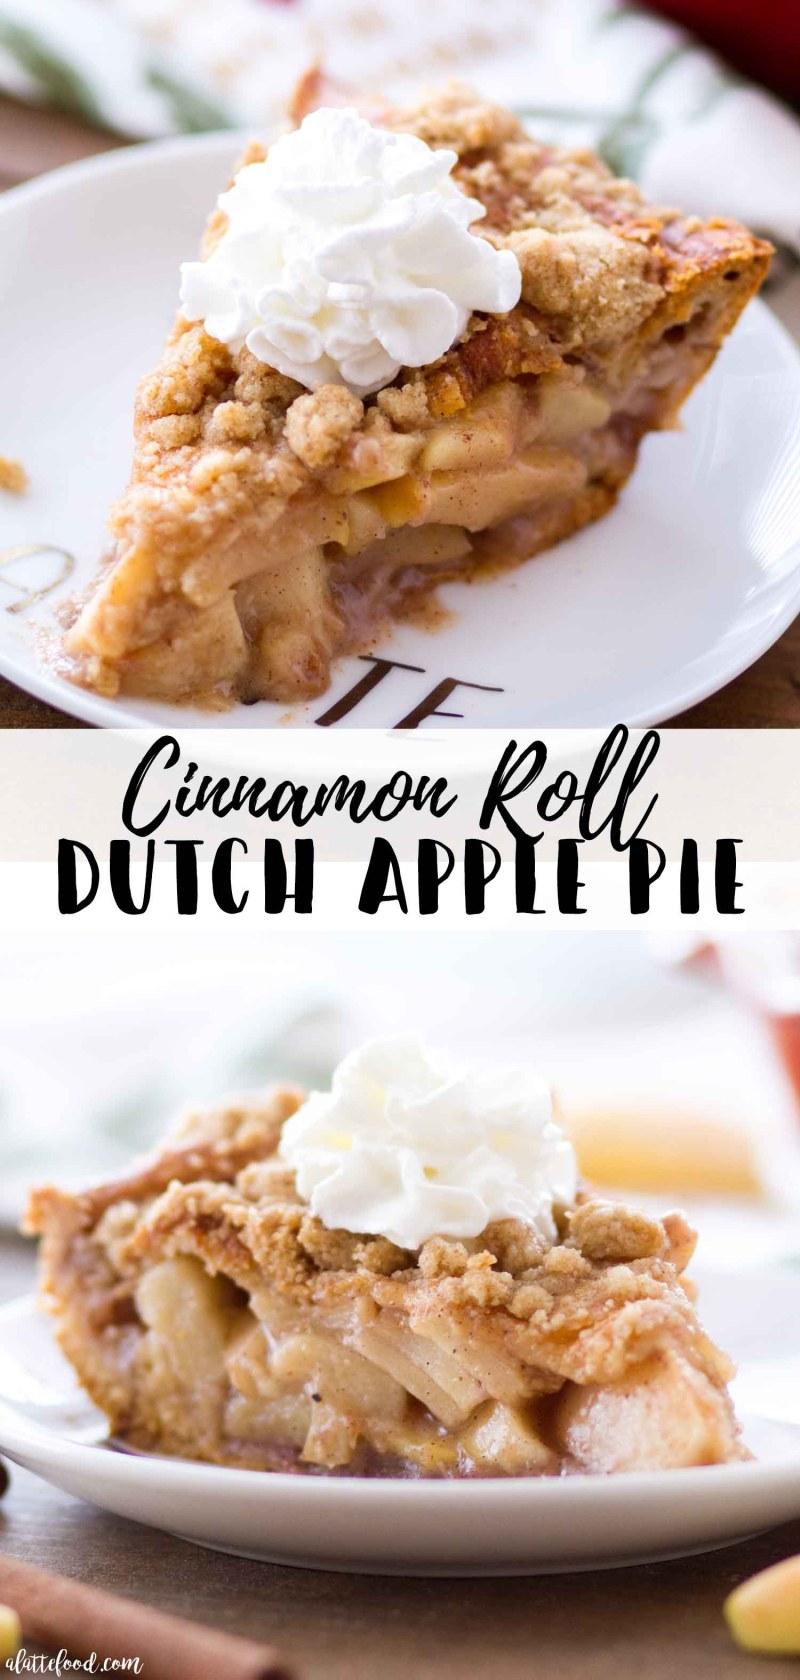 Homemade Cinnamon Roll Dutch Apple Pie (a cinnamon roll crust with homemade apple pie filling).